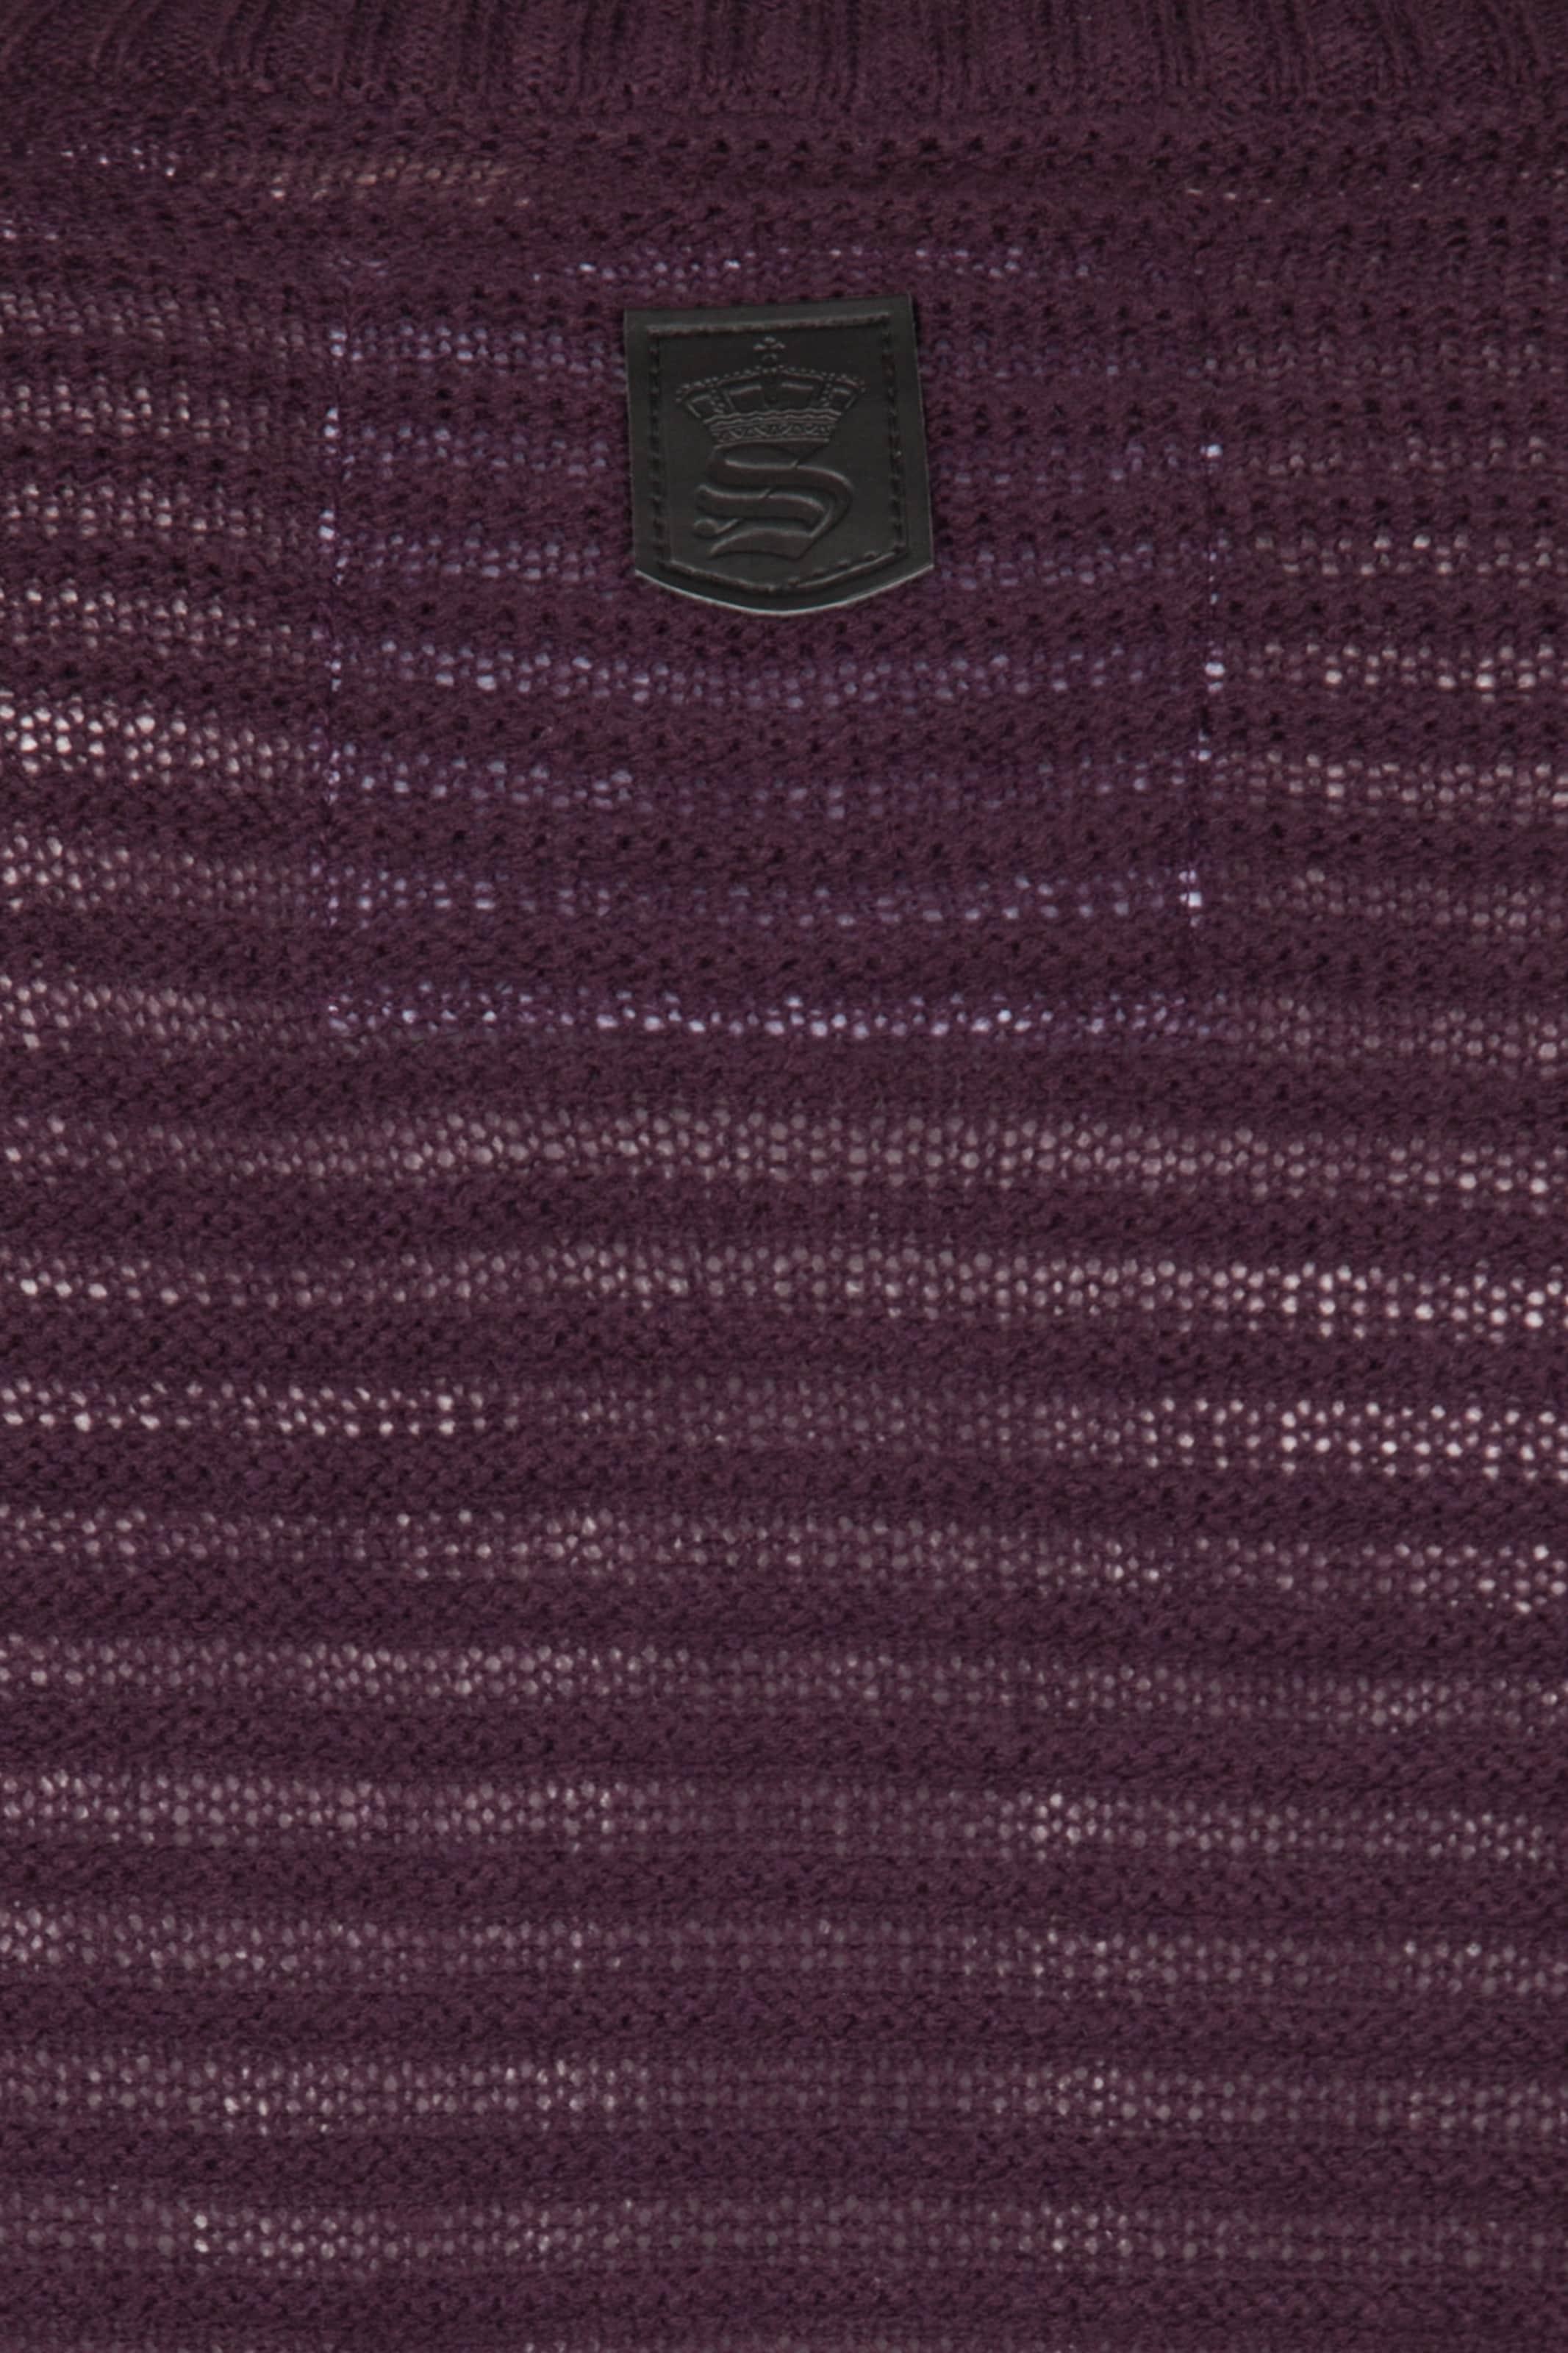 Beere Soulstar Soulstar Soulstar In Beere In Beere Pullover Pullover Pullover In KTF1clJ